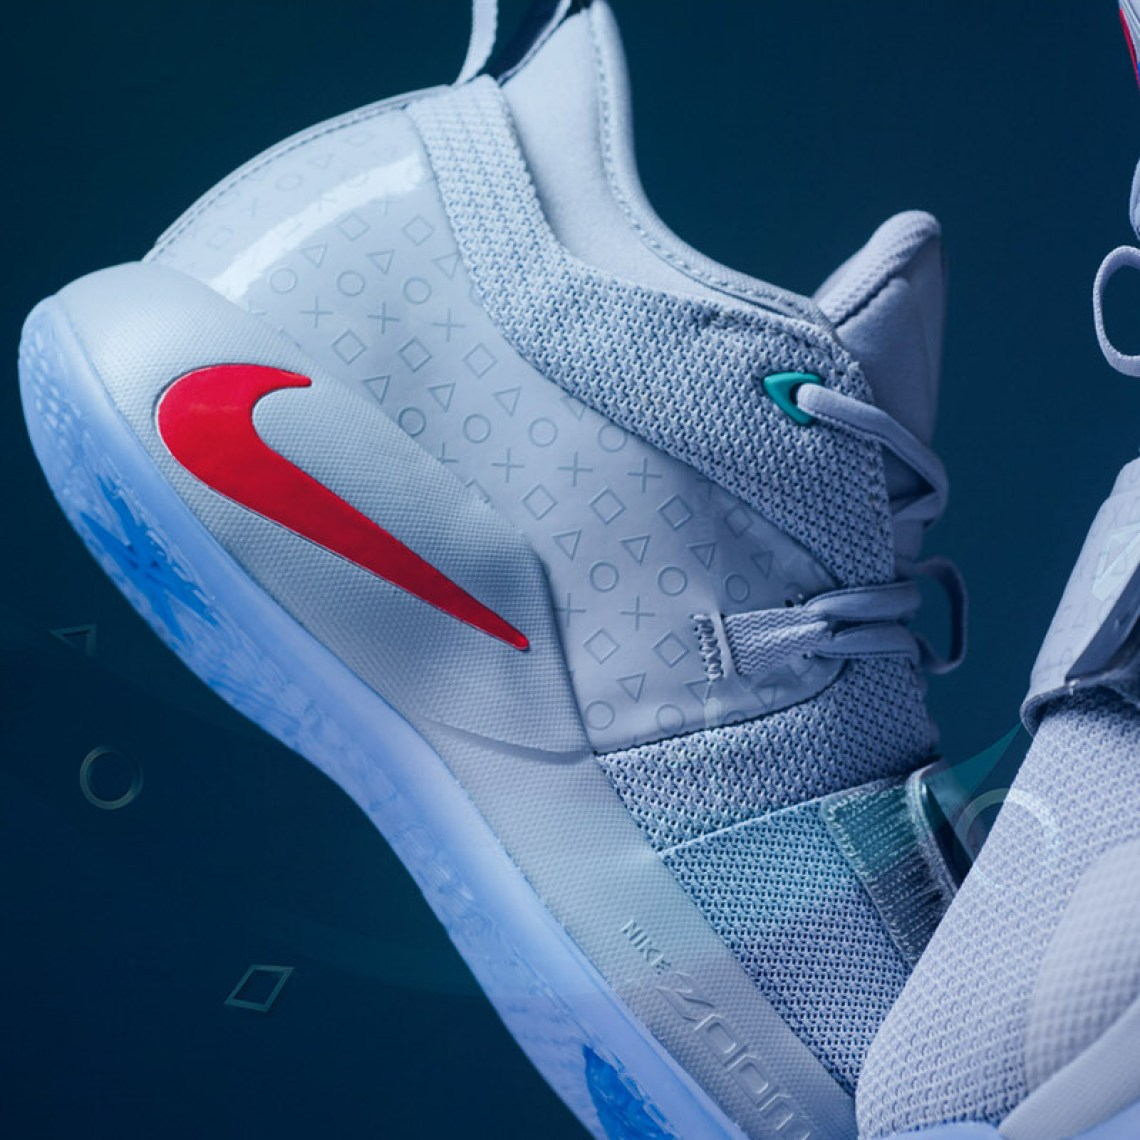 size 40 df713 78f14 Playstation X Nike Pg 2 5 Grey Arrives This Weekend Nice Kicks